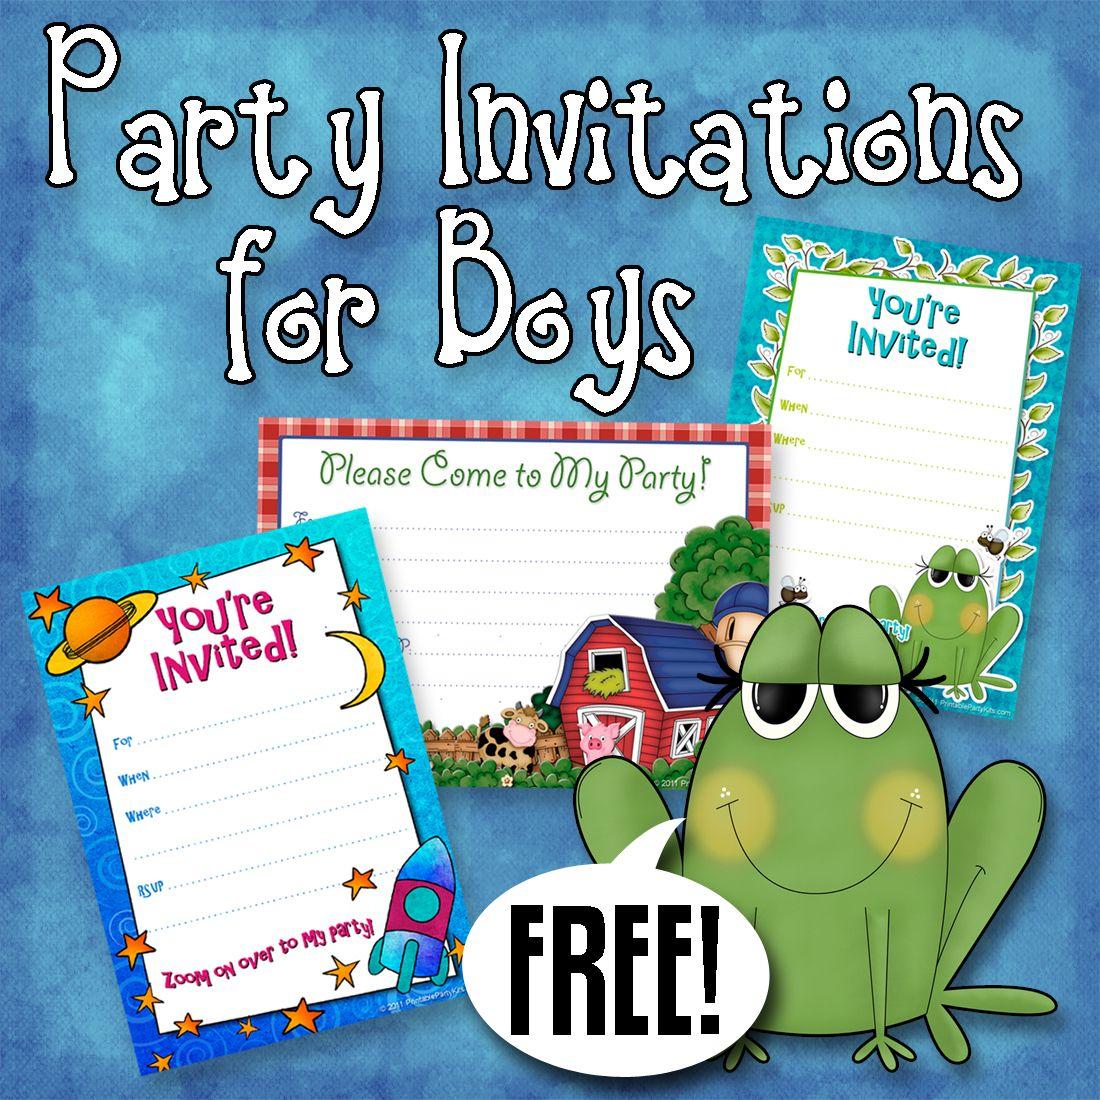 Free Printable Boys Birthday Party Invitations   Party Printables - Free Printable Toddler Birthday Invitations